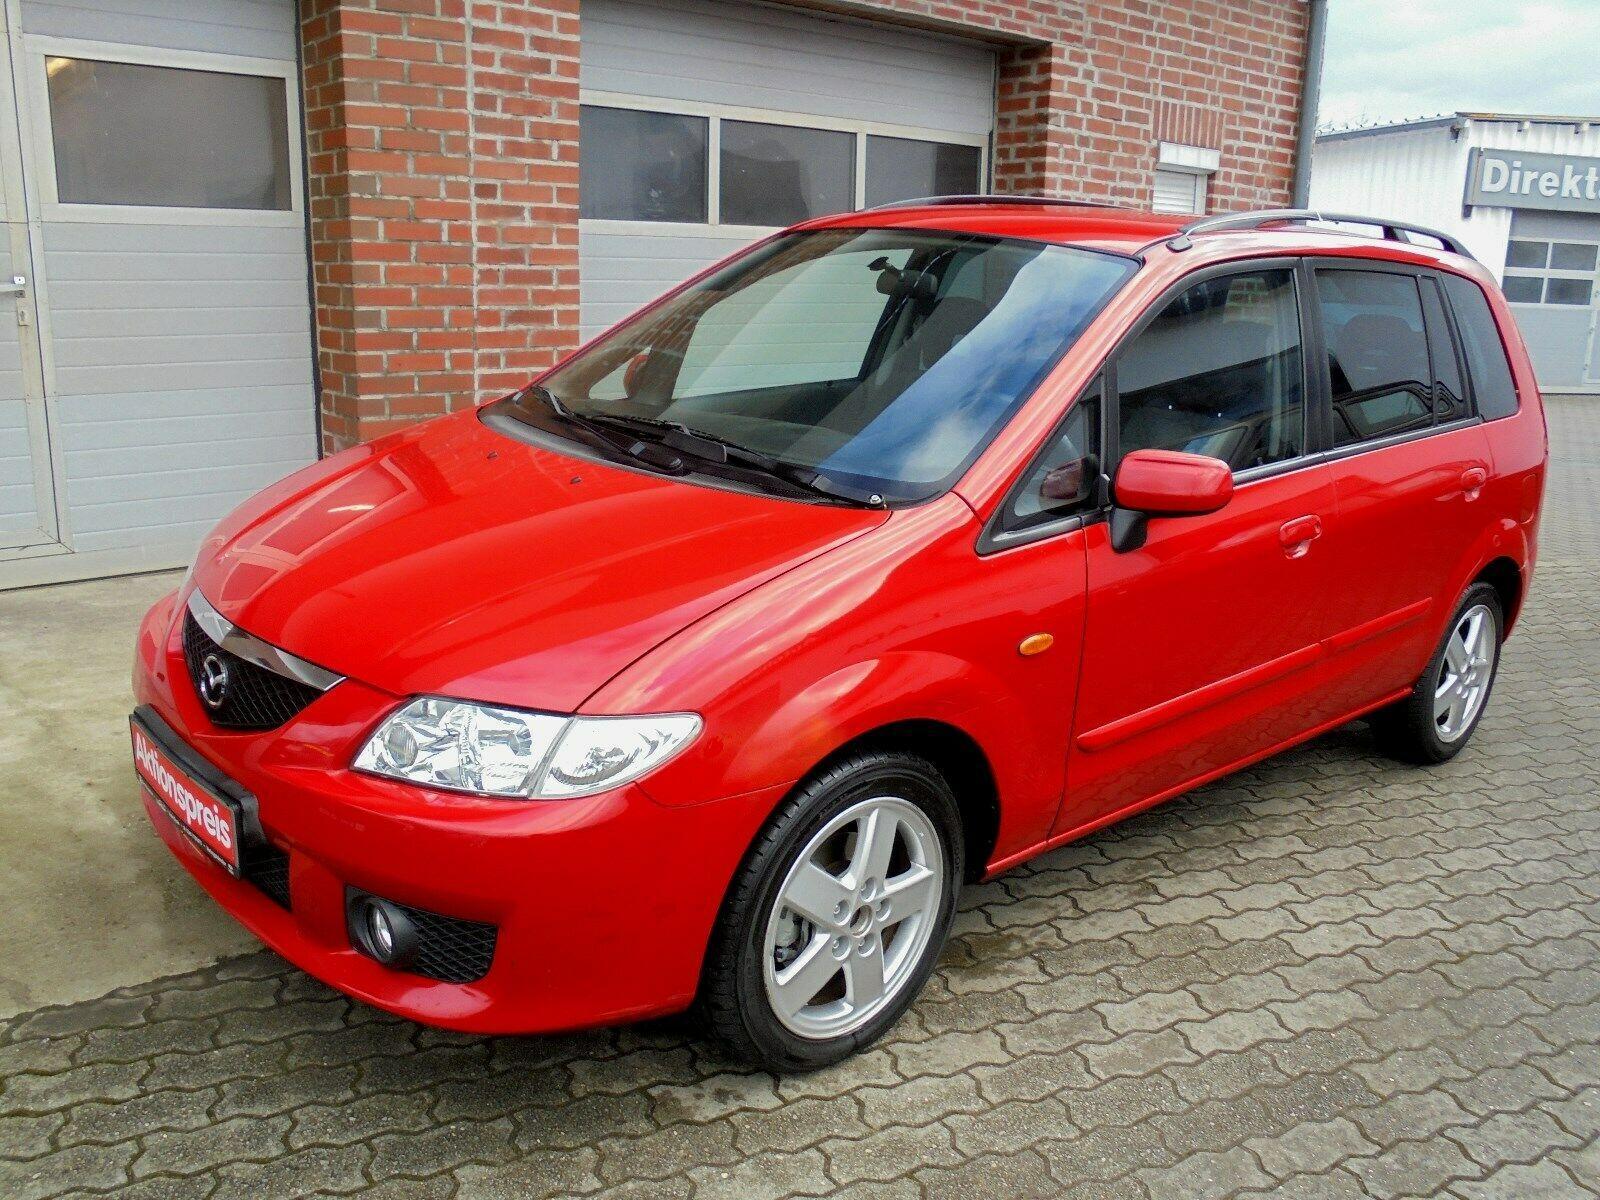 Mazda Premacy 2.0 - Hoch hinaus